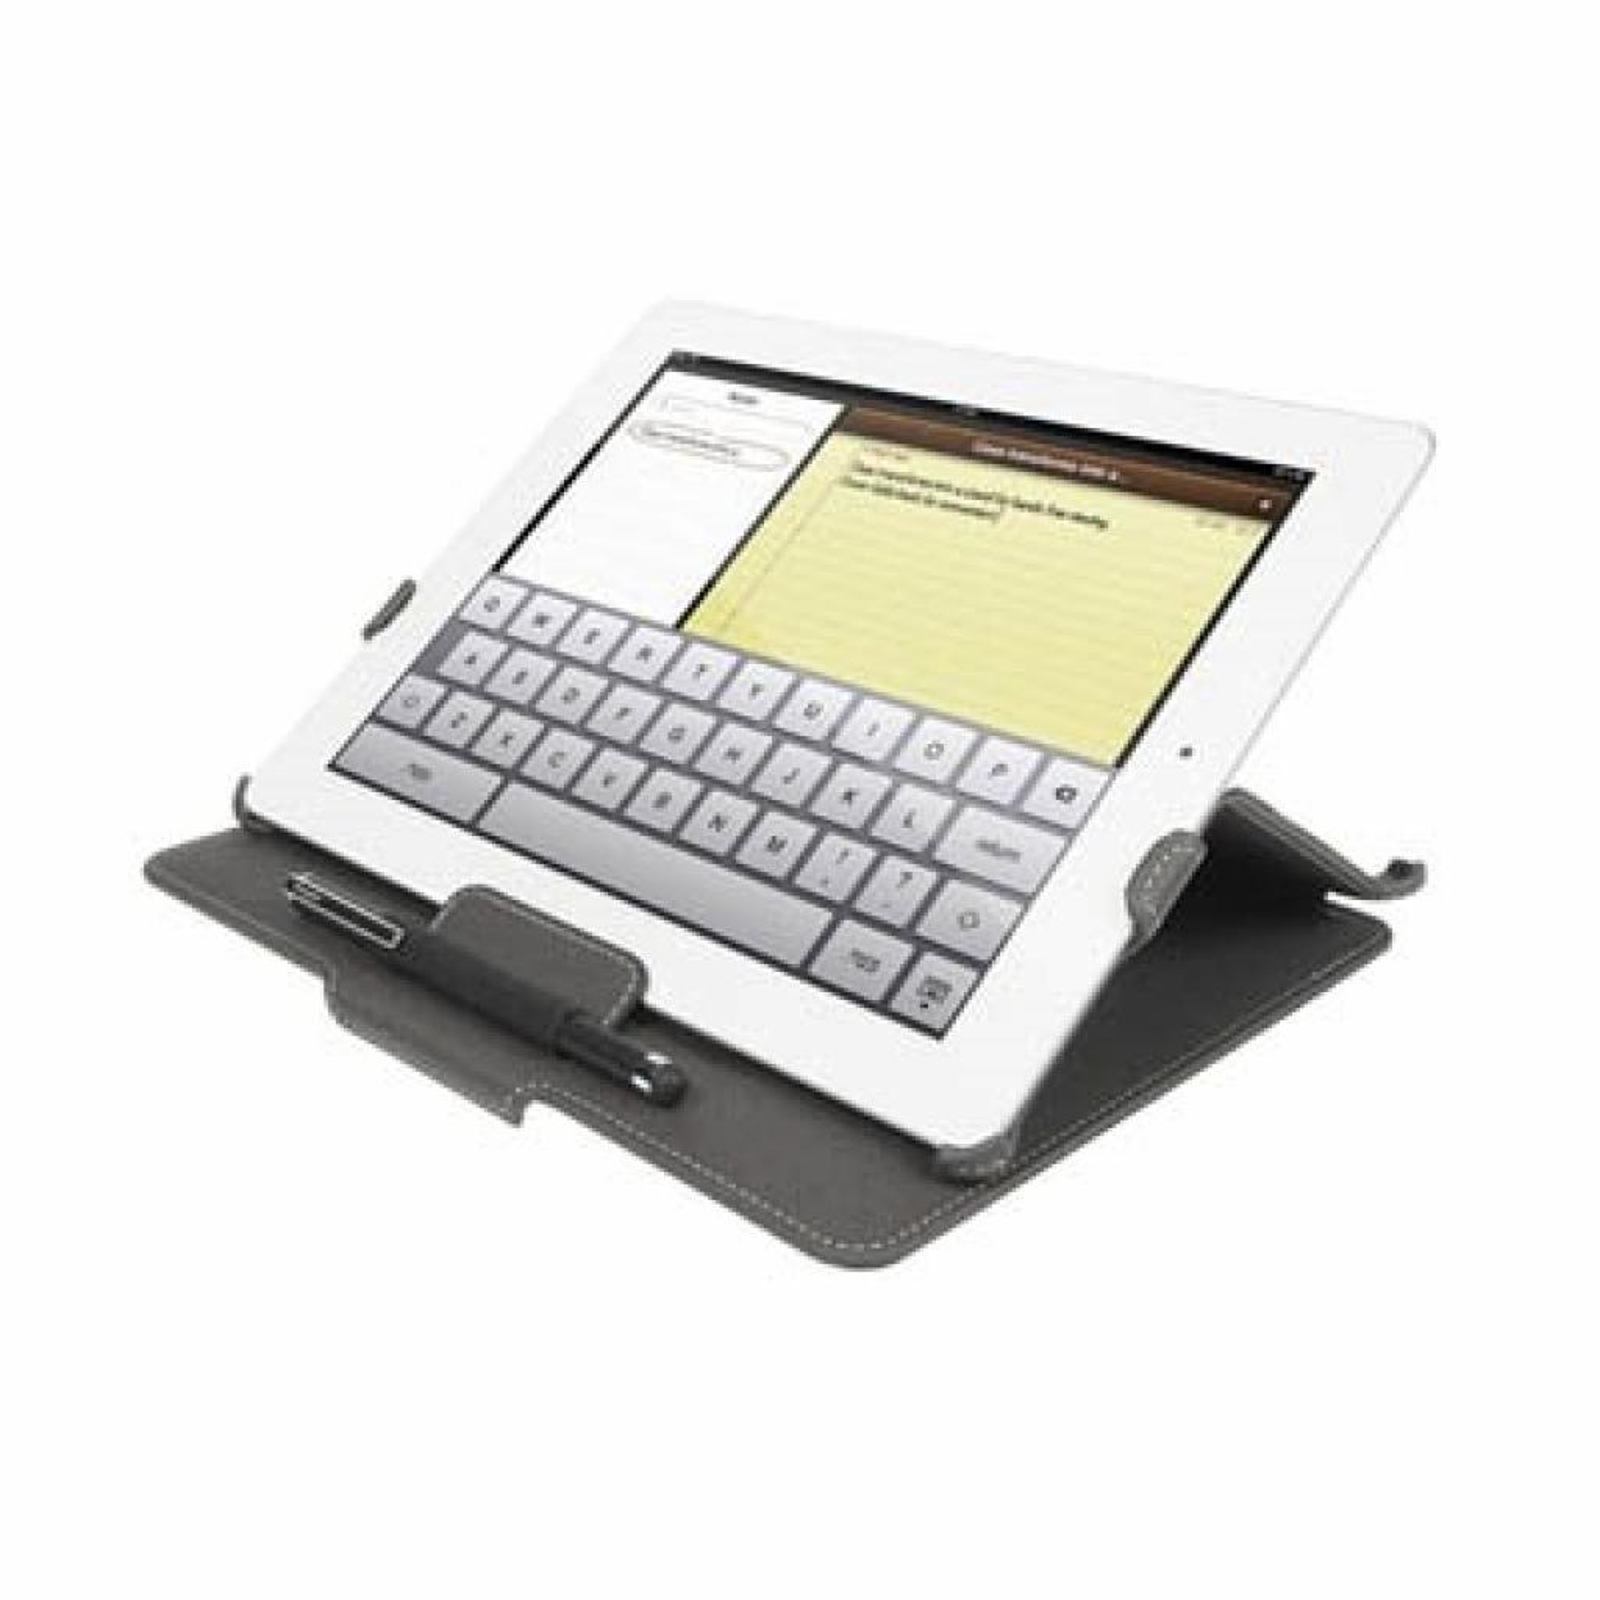 Чехол для планшета Targus iPad3 Vuscape Protective Cover with Stand (THZ15702EU-50) изображение 2